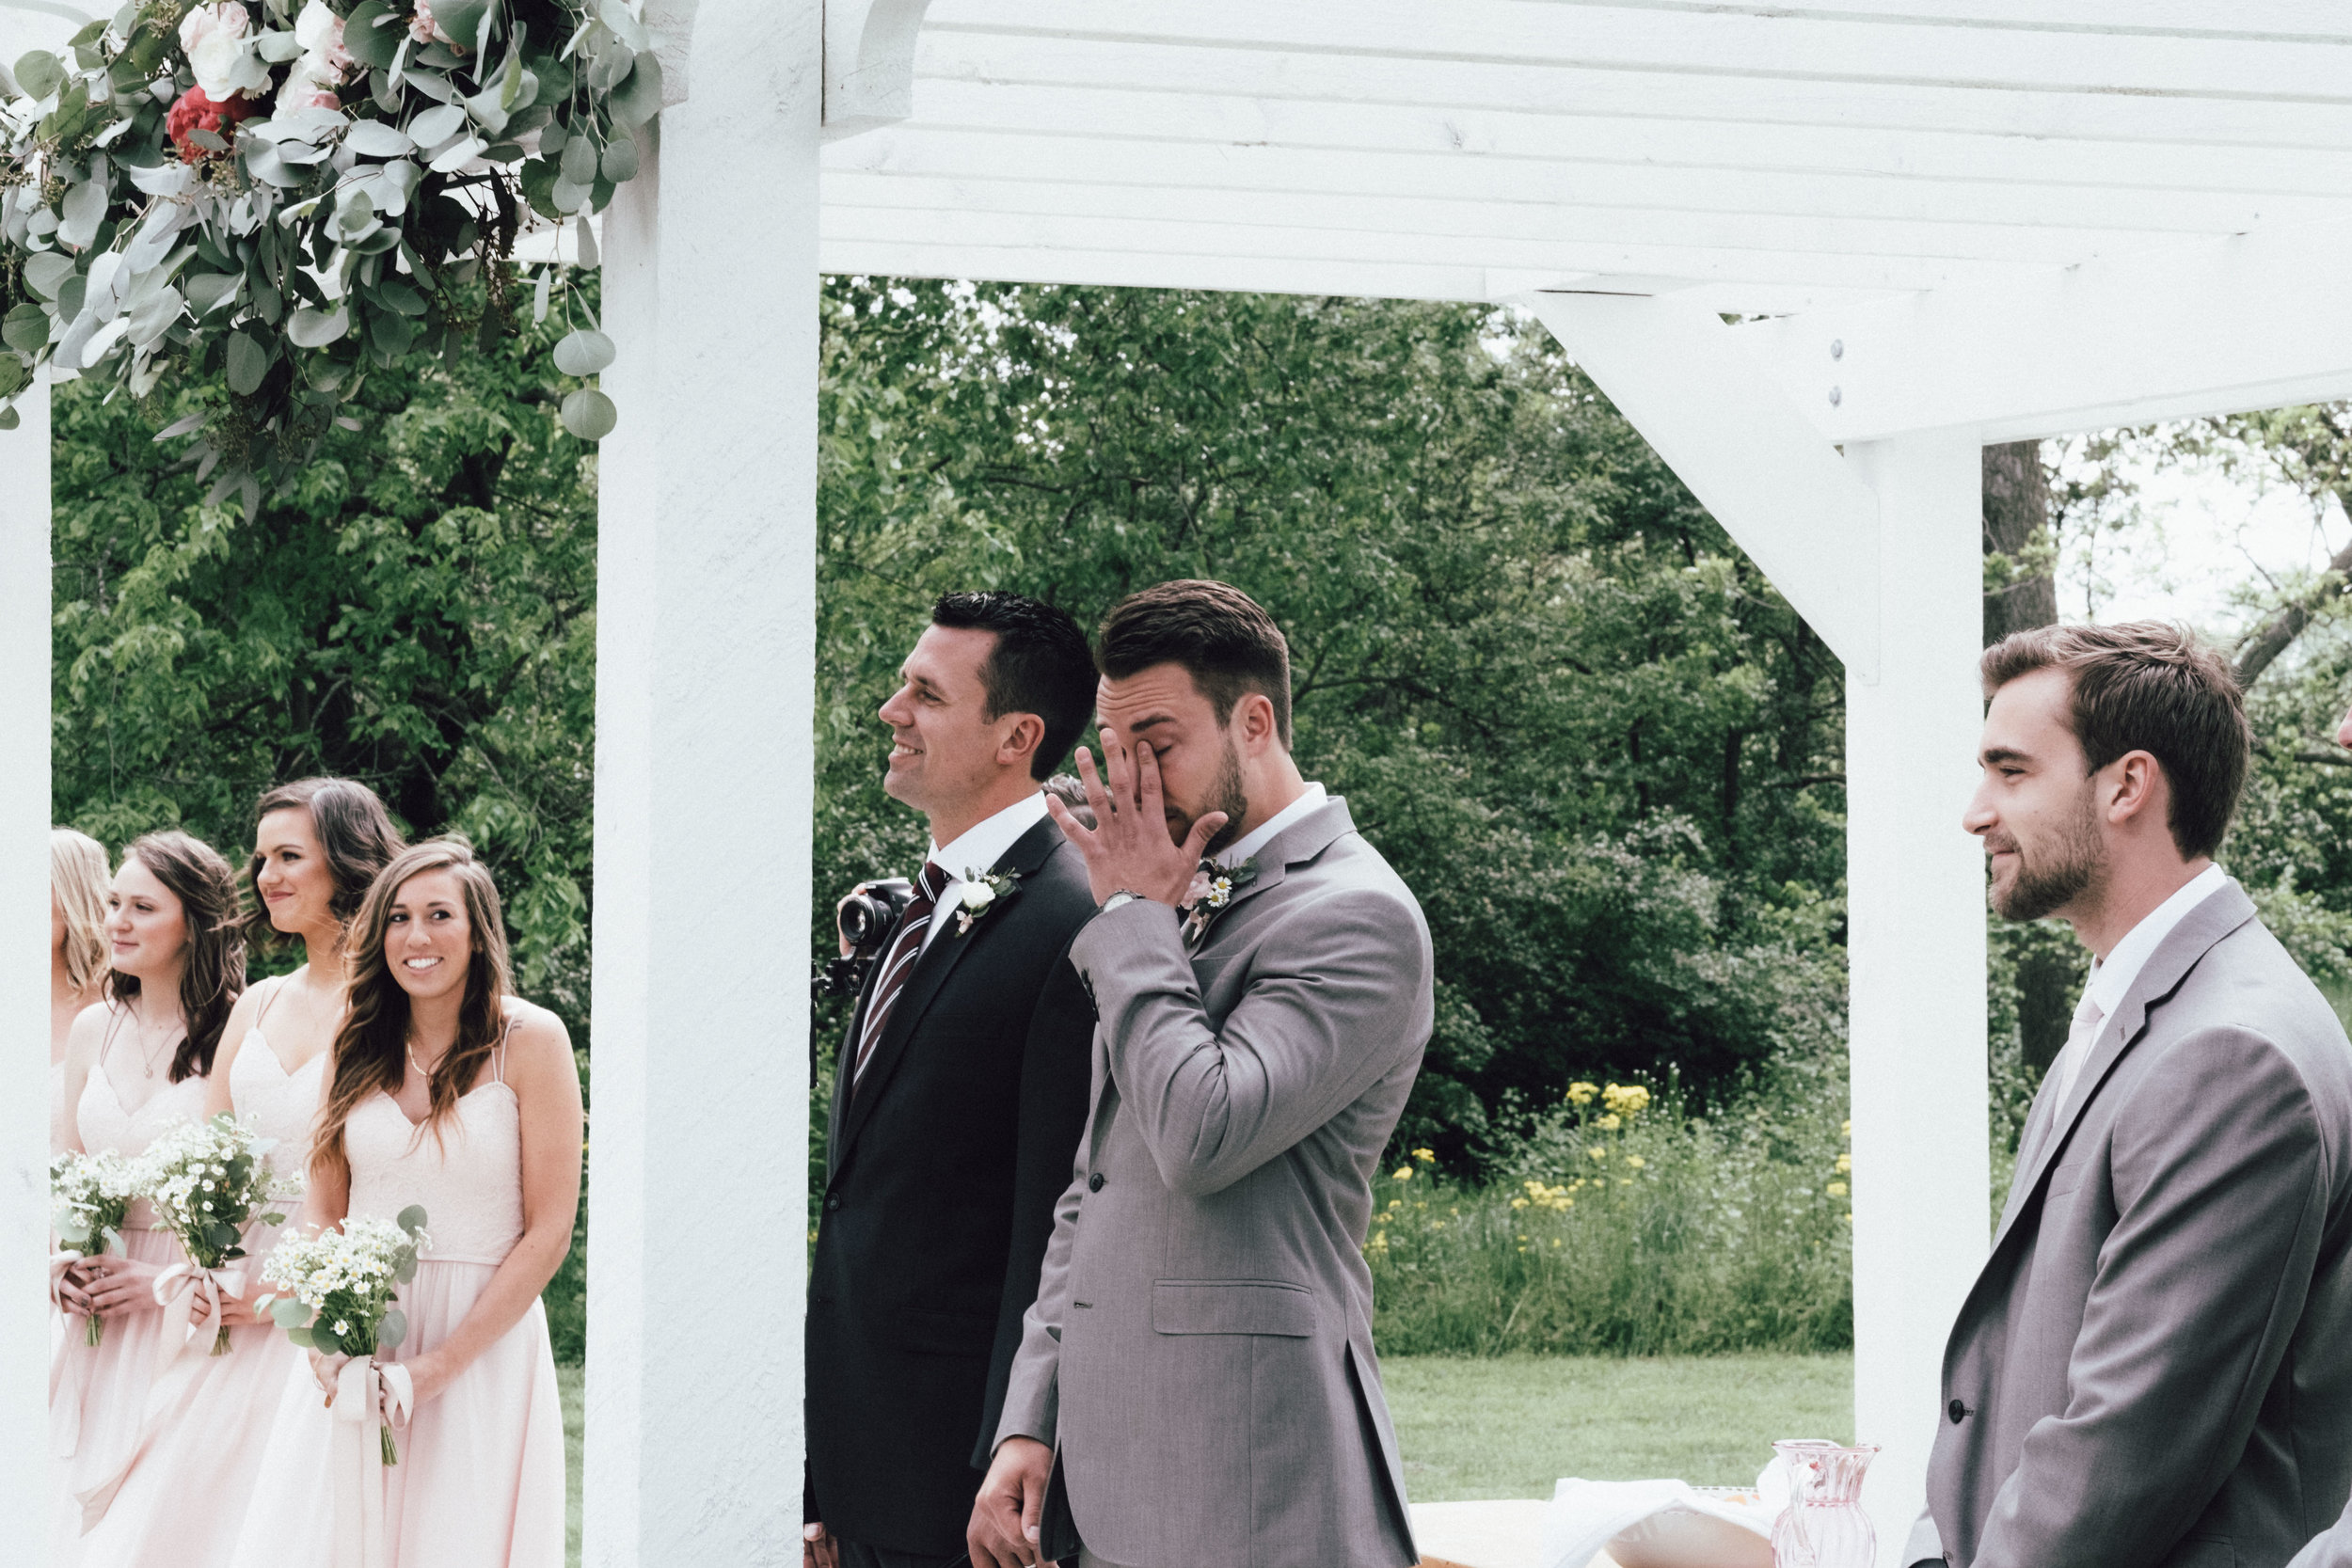 Steph-Ben-Blog-Indianapolis-Wedding-36.jpg